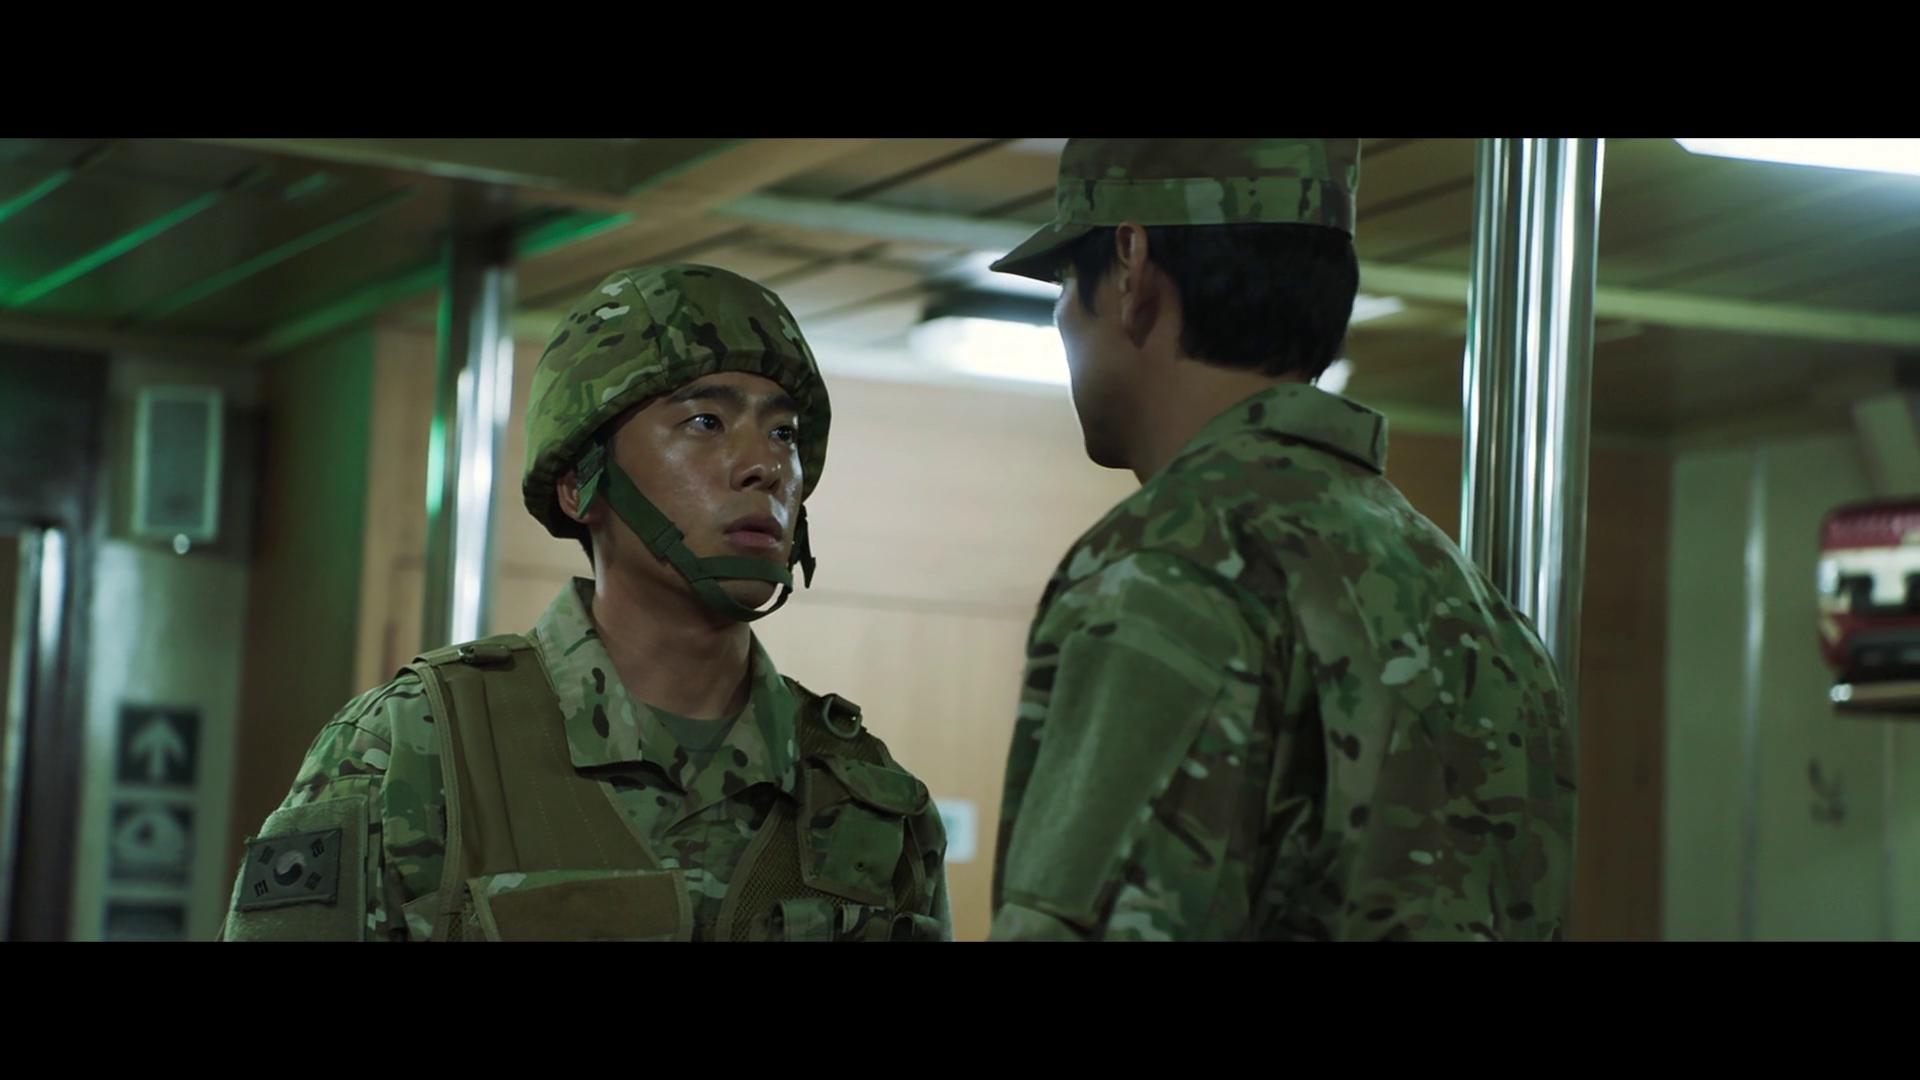 Estacion Zombie 2: Peninsula (2020) 1080p 60FPS BDrip Latino